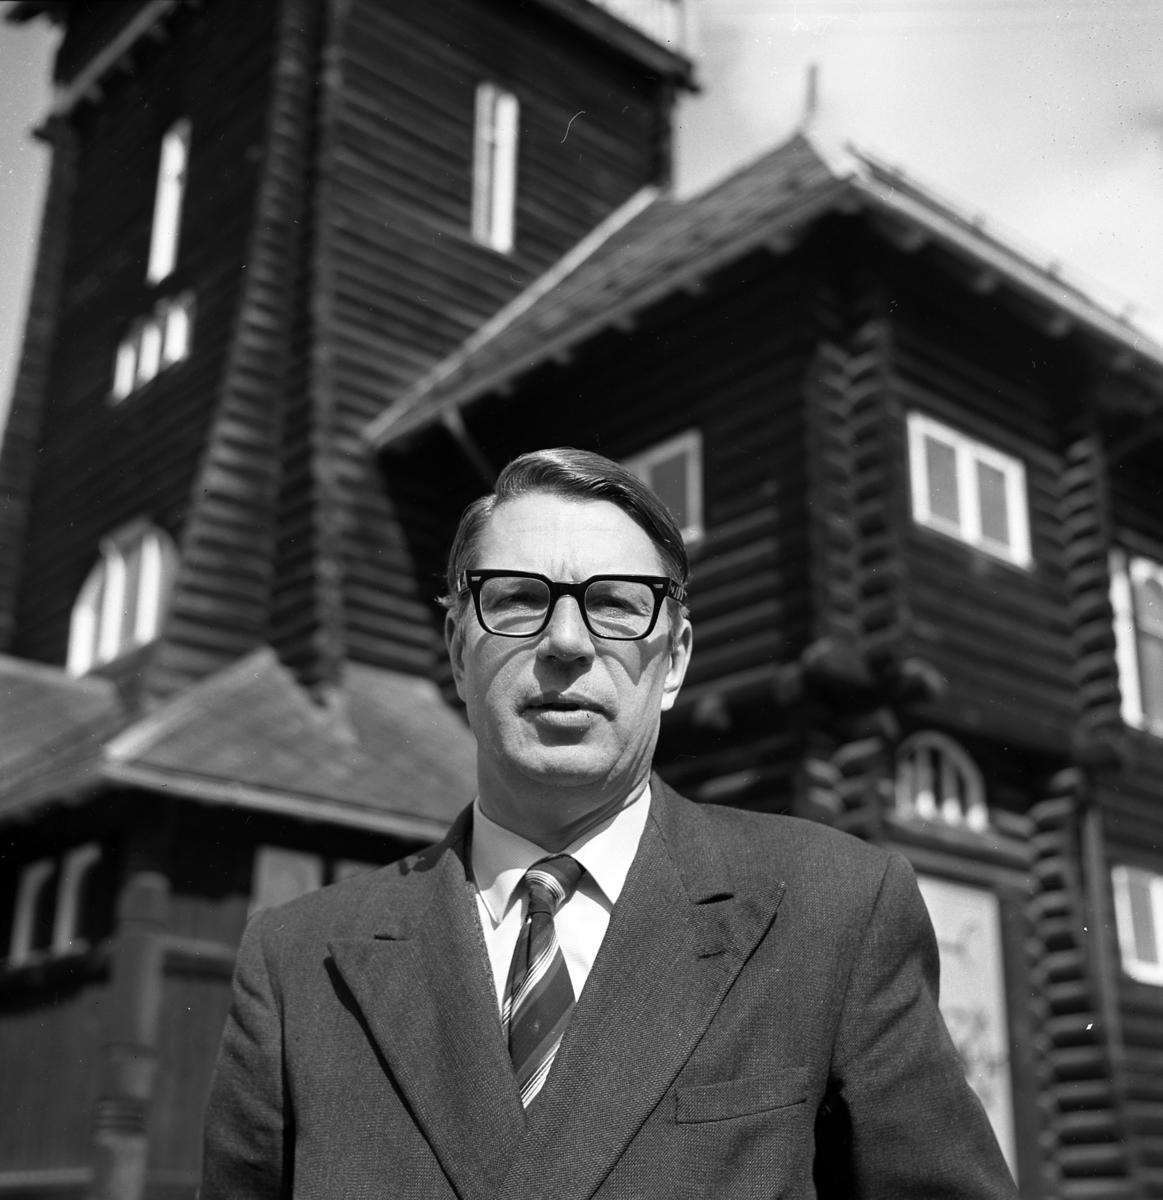 William Høyer